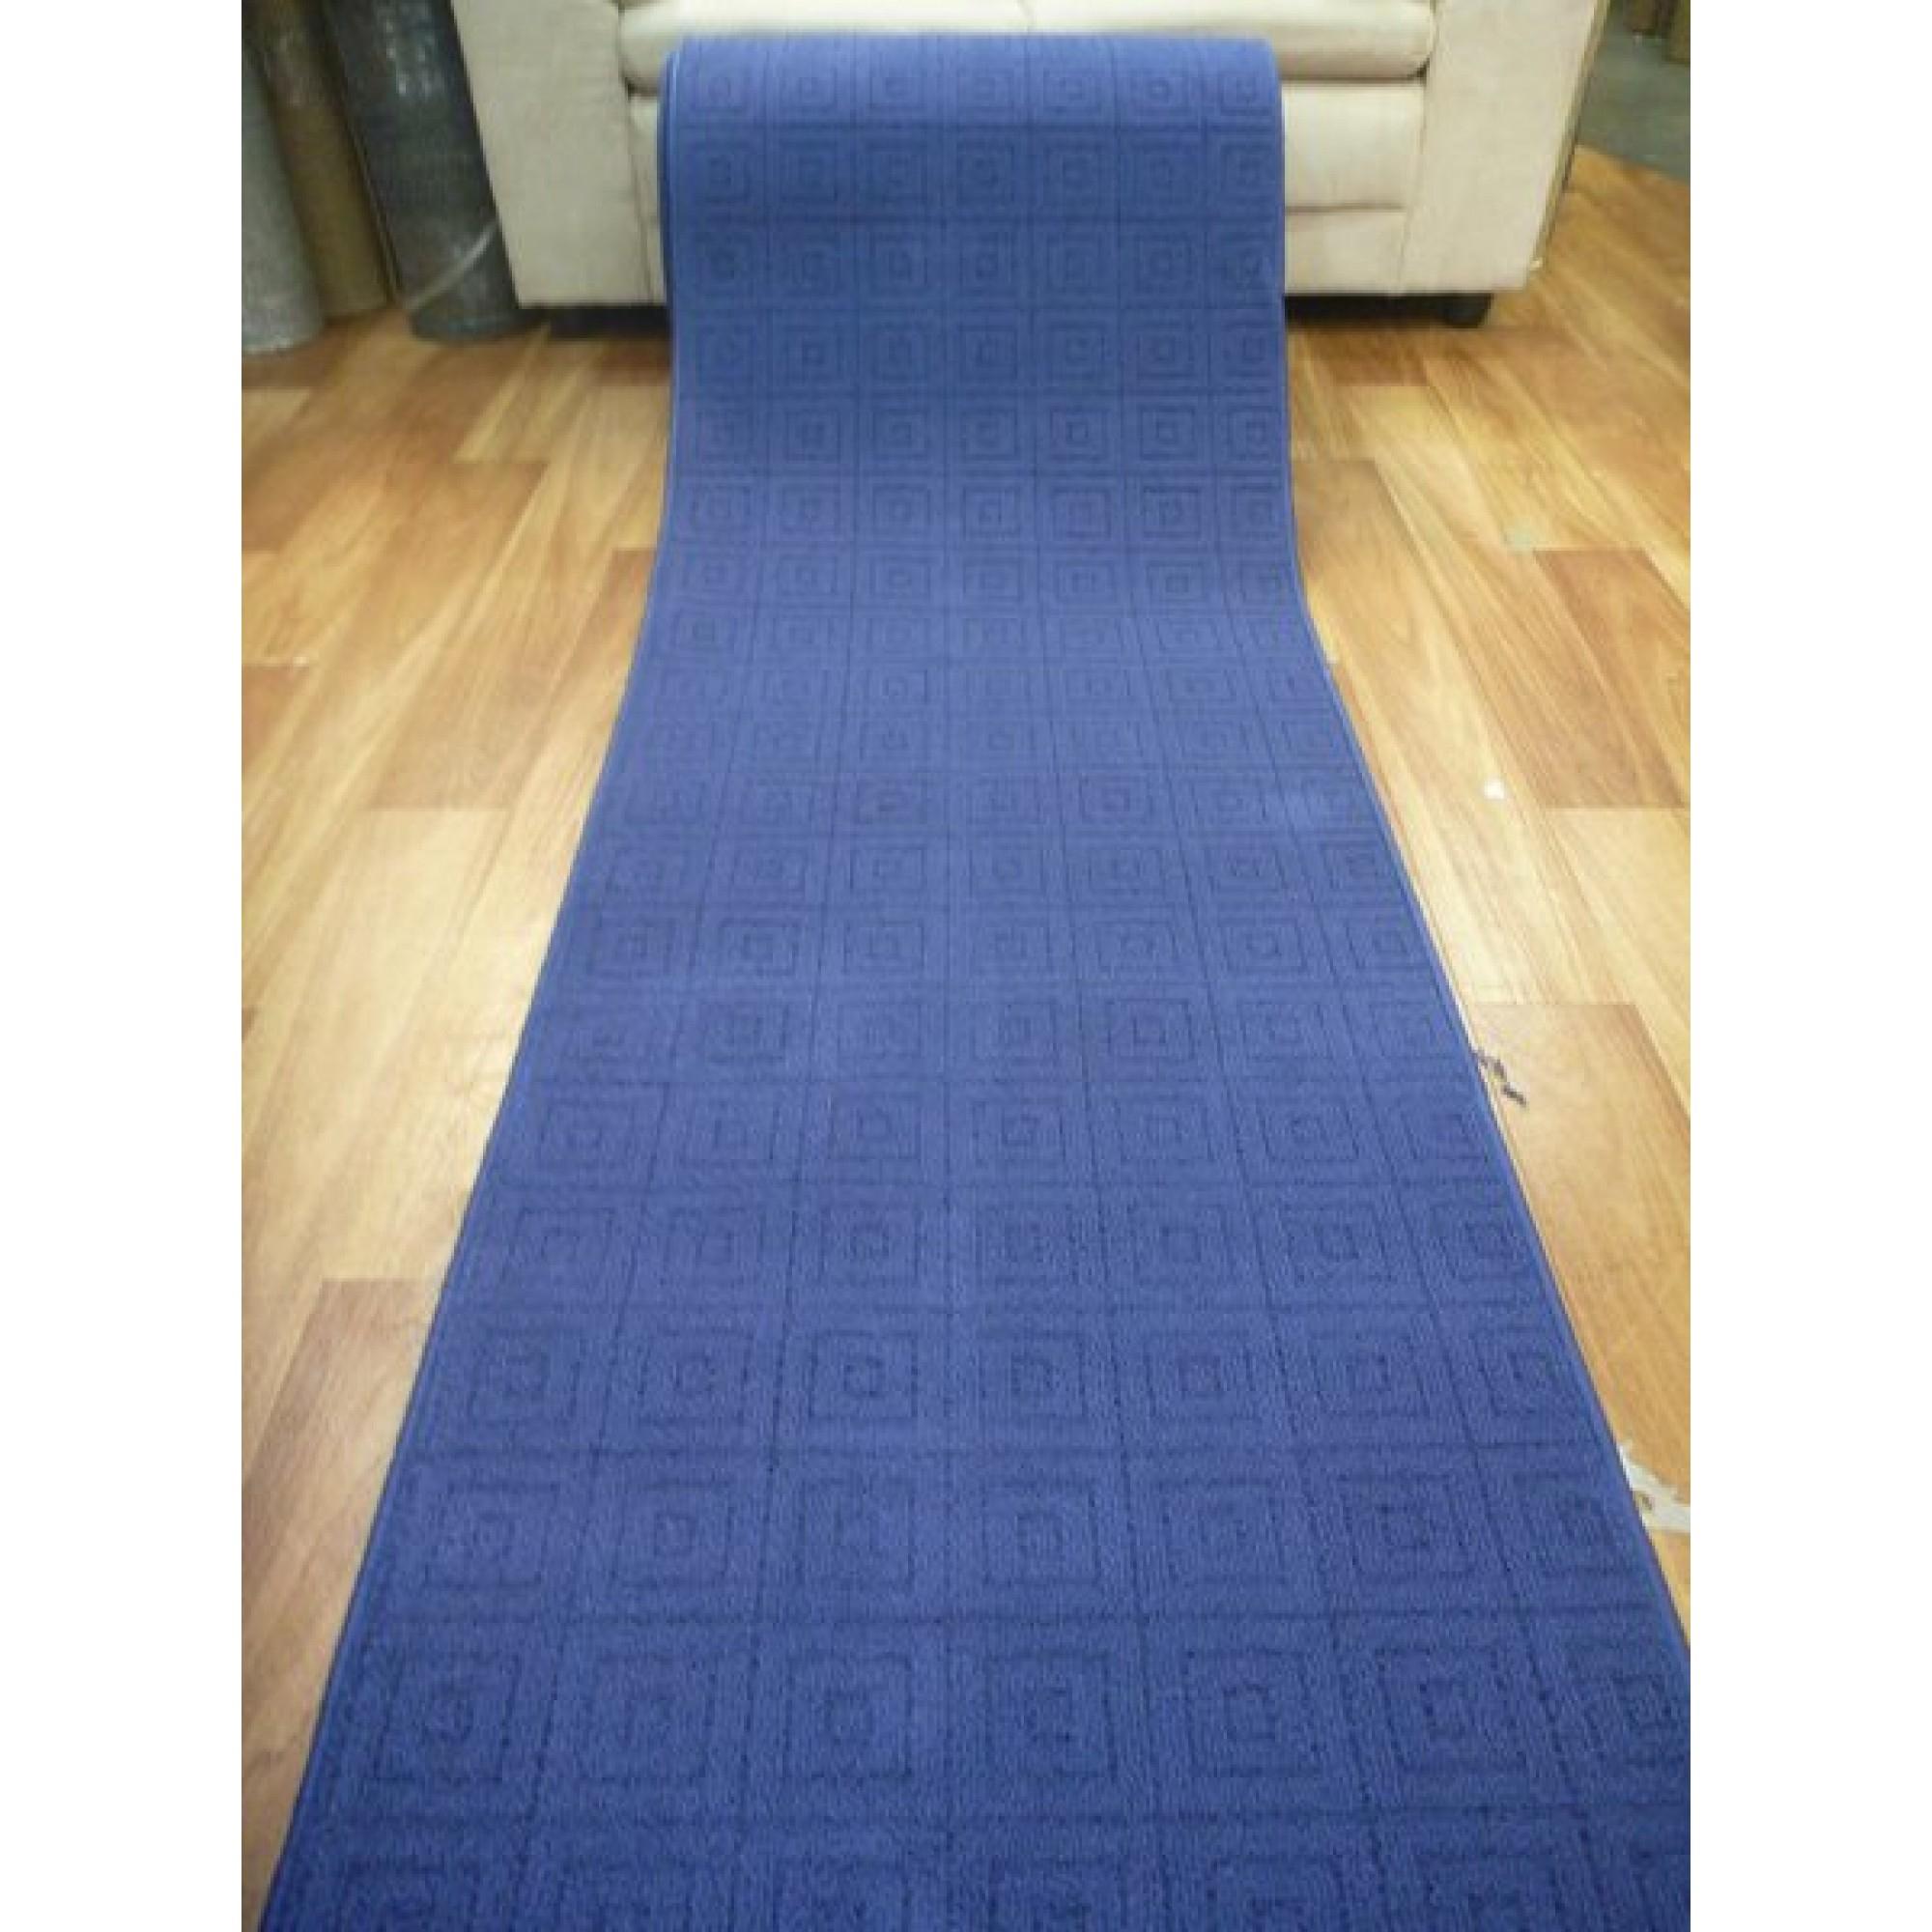 Flooring Hallway Runners Runner Hallway Cheap Rug Runners Inside Blue Rug Runners For Hallways (#10 of 20)